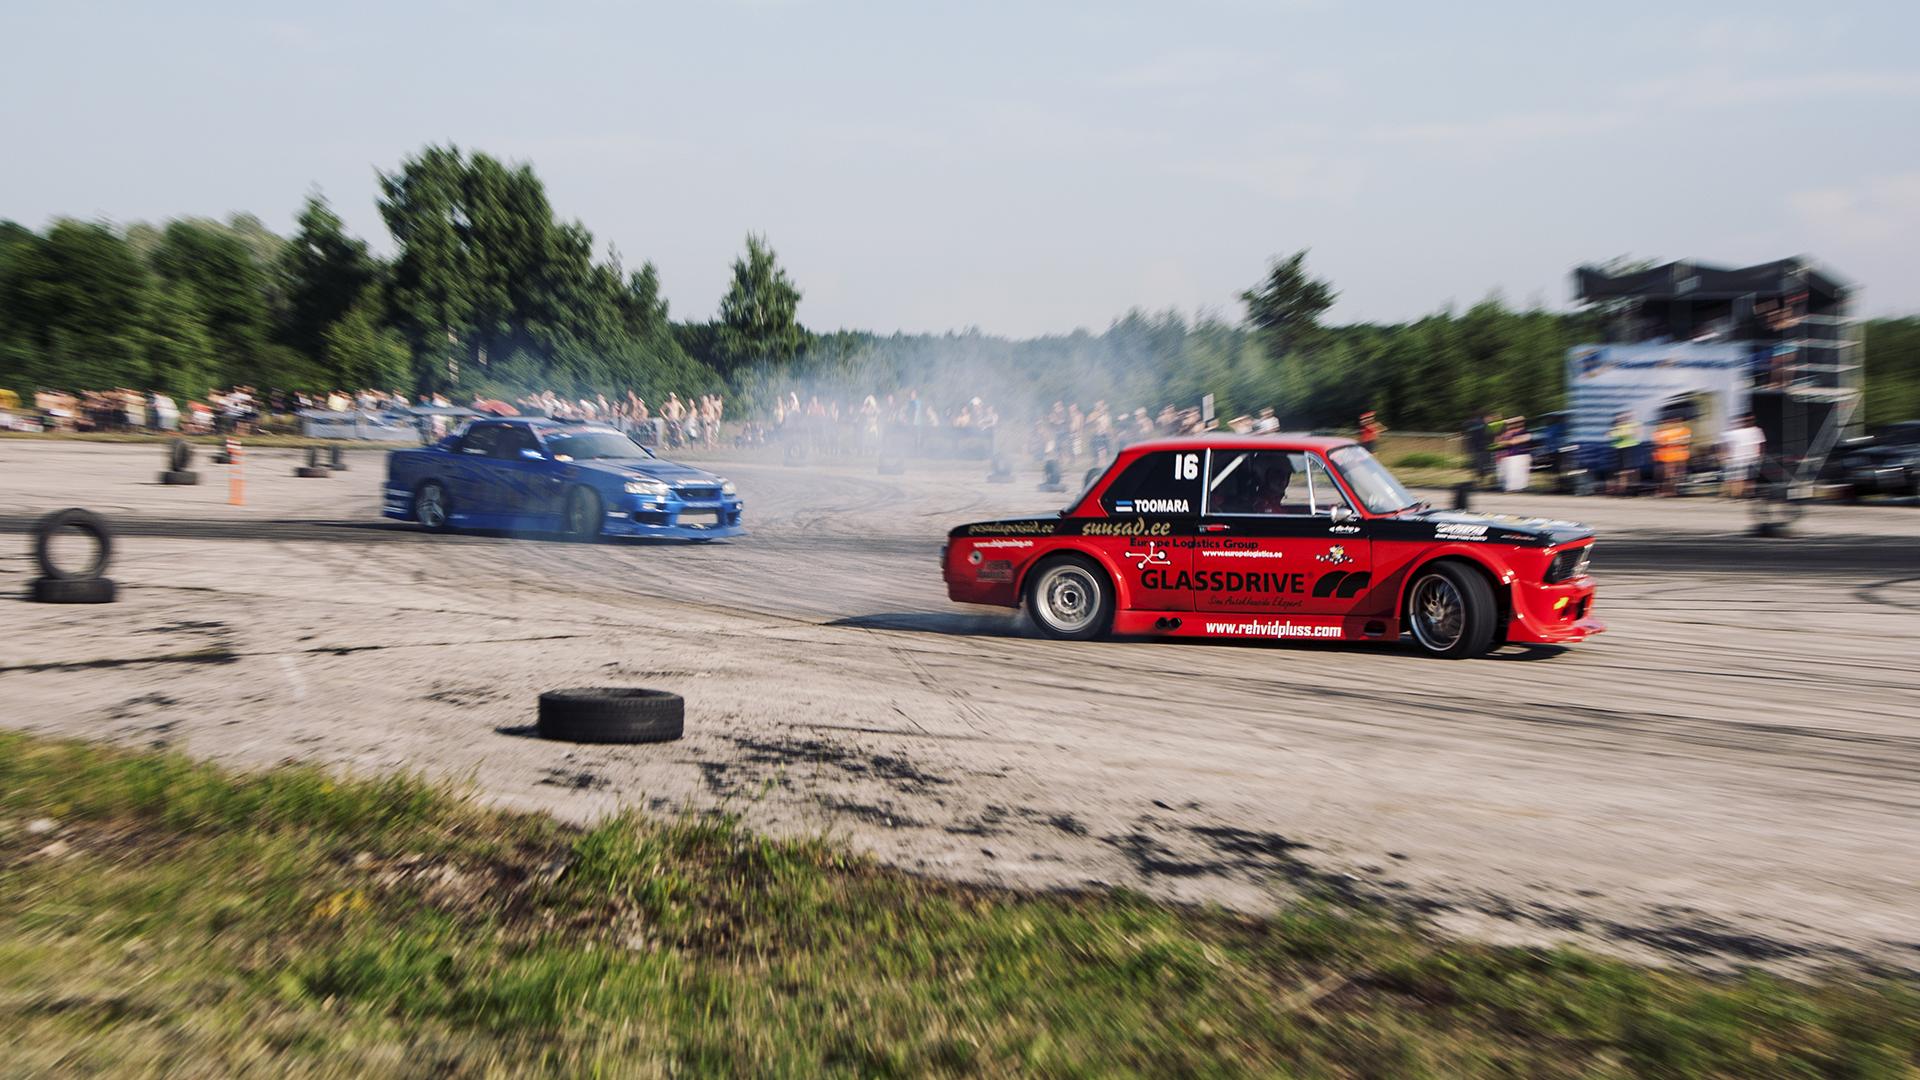 10-years-of-drifting-in-estonia-2011-by-wheelsbywovka-2